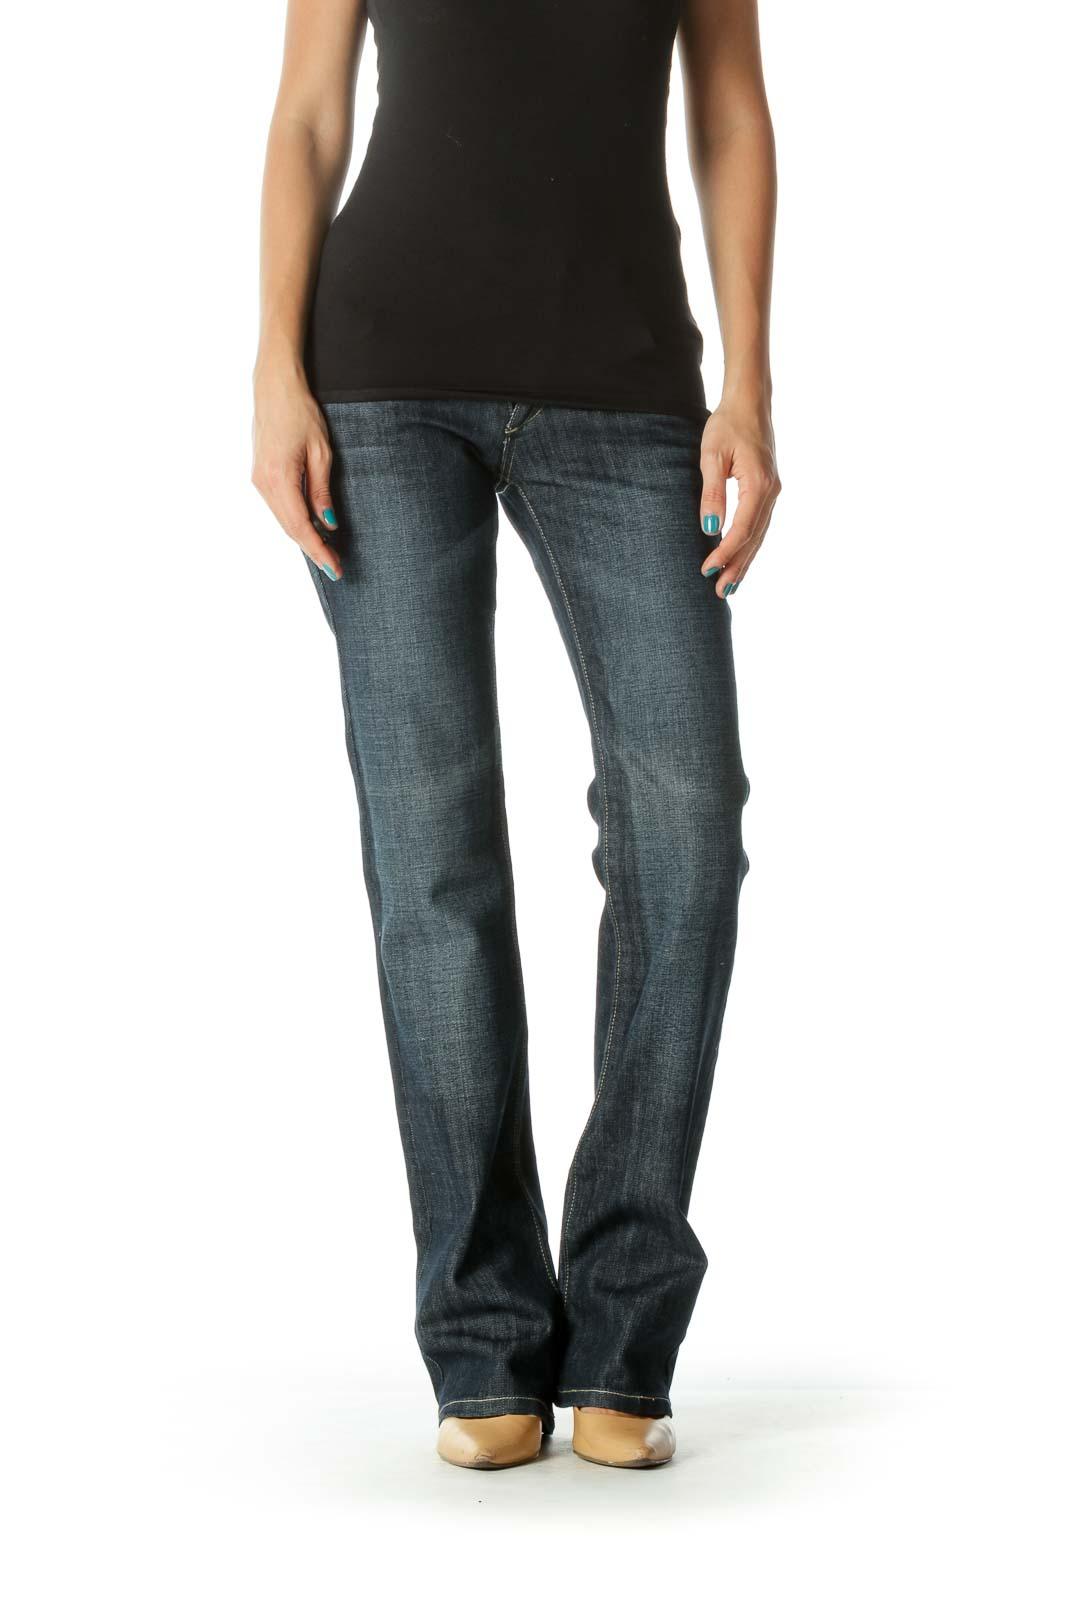 Blue Mid Rise Dark Wash Stone Wash Flared Denim Jeans